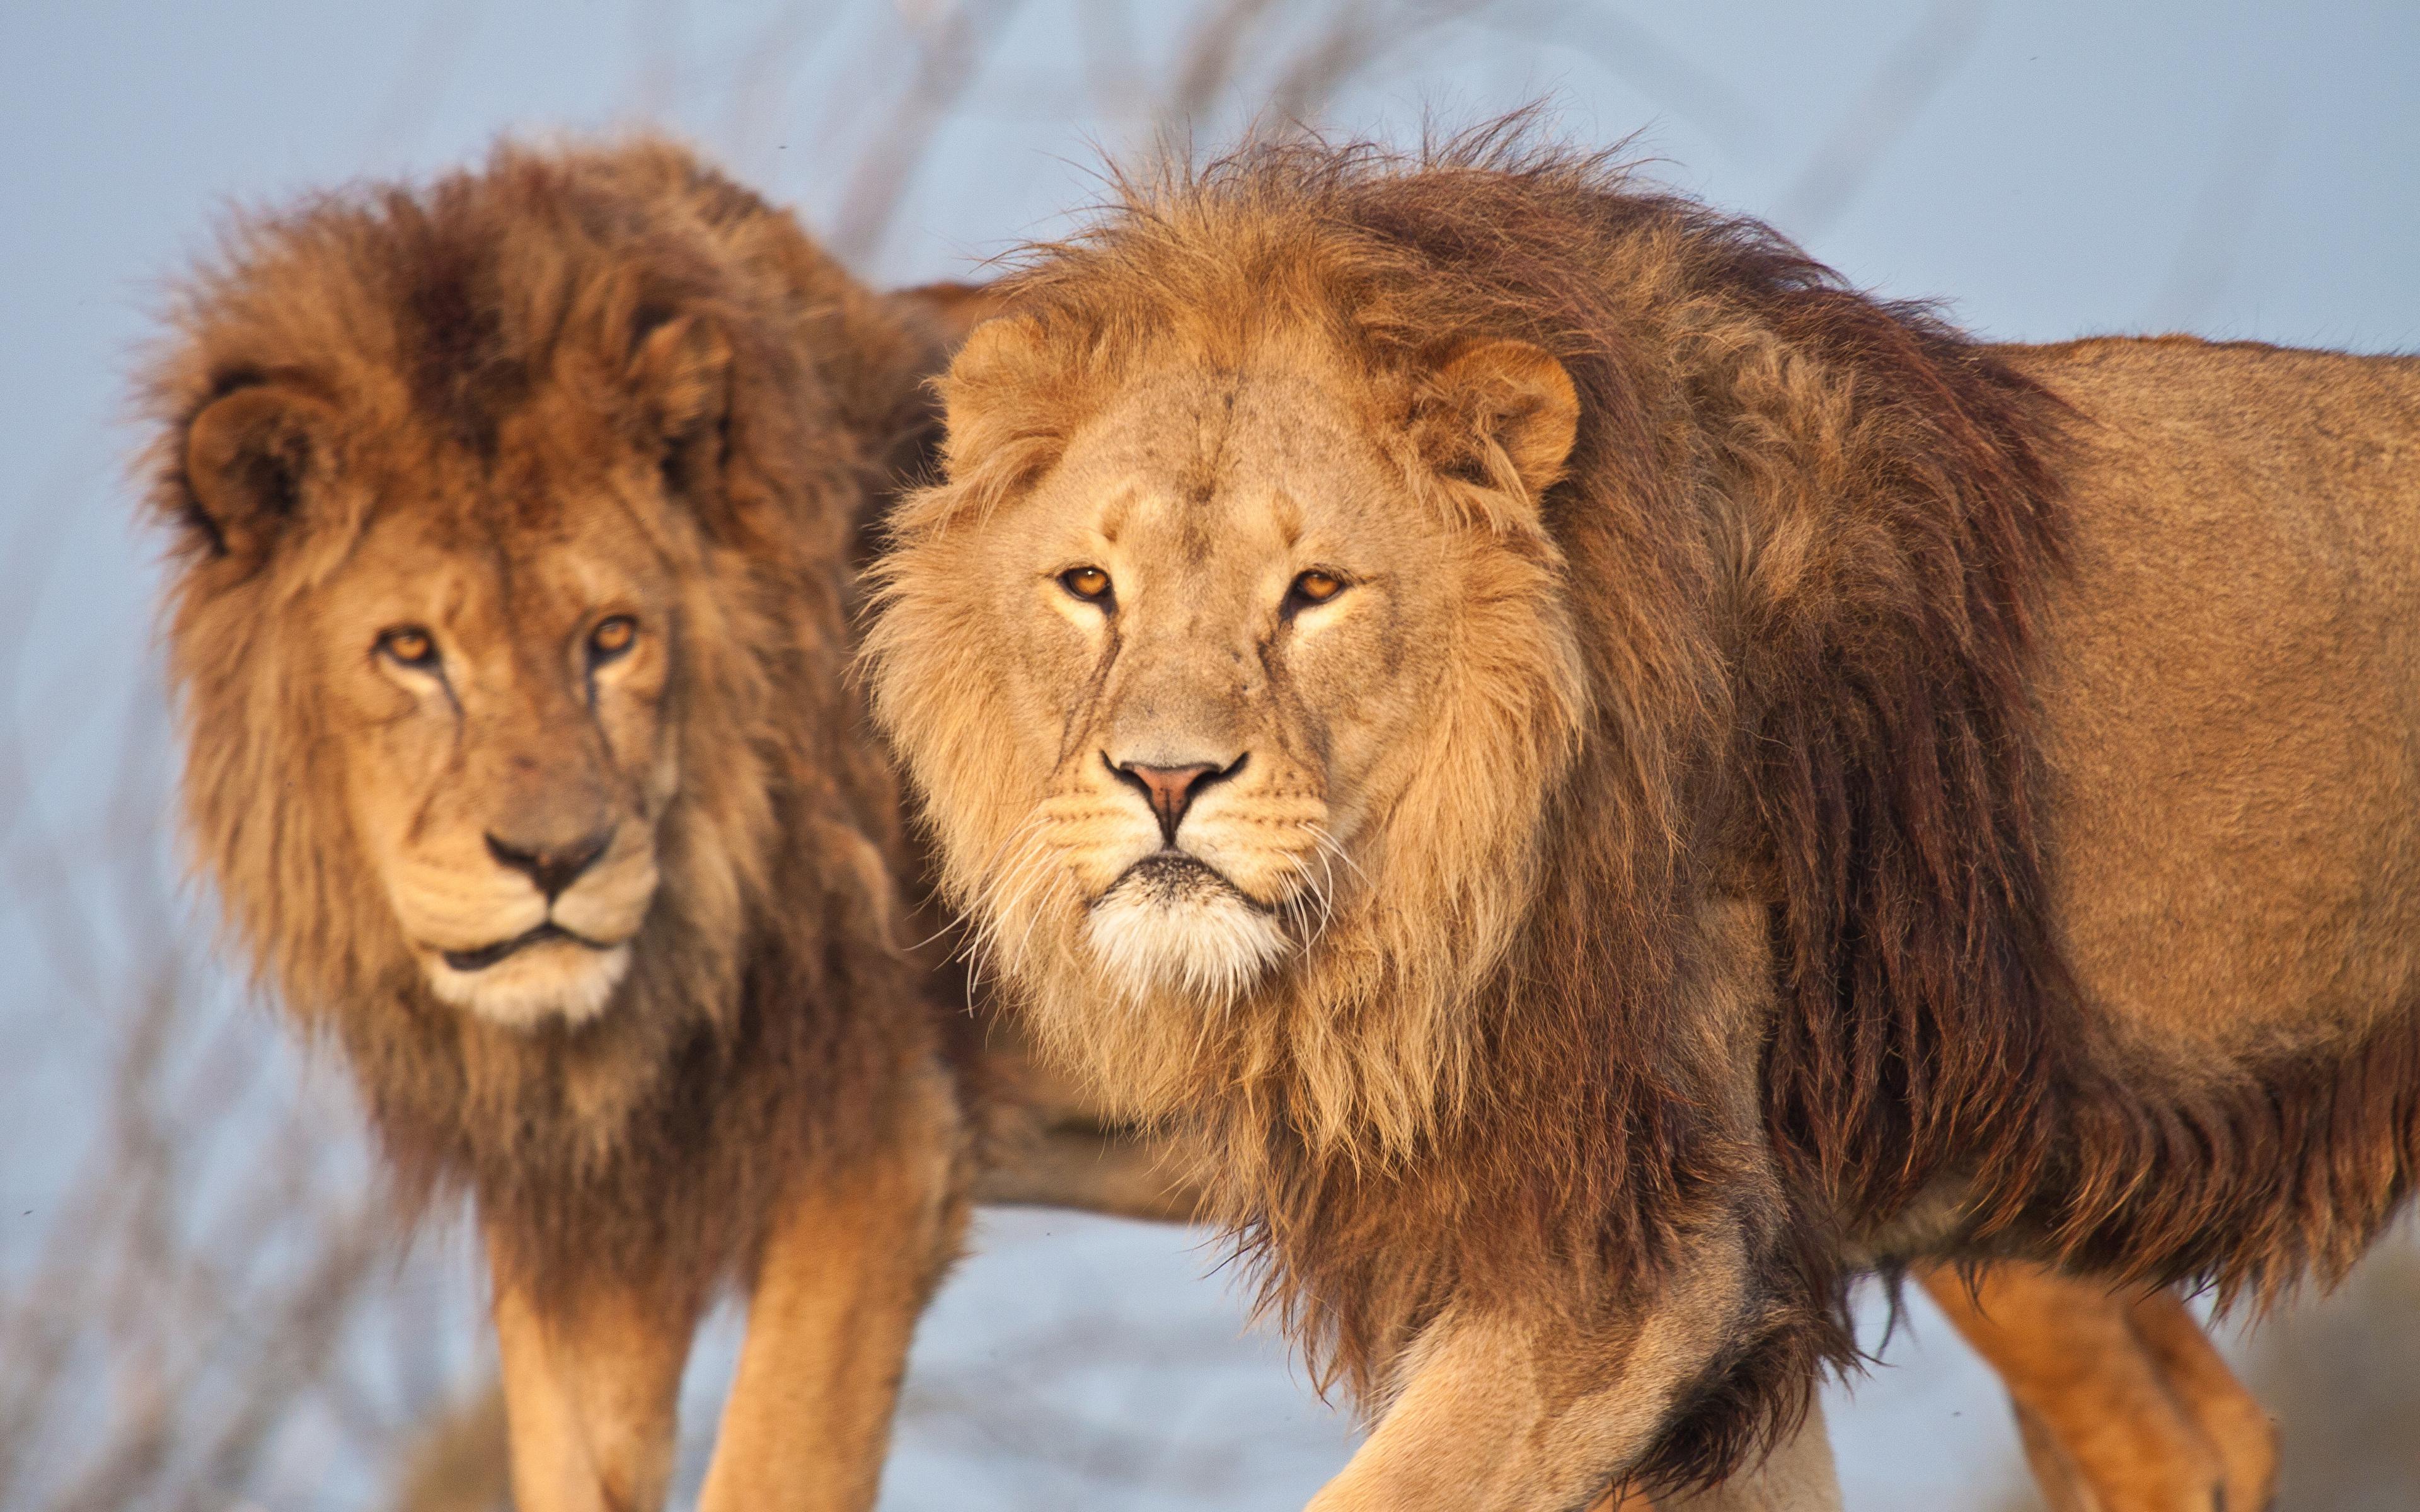 Foton Lejon Pantherinae Två 2 Djur 3840x2400